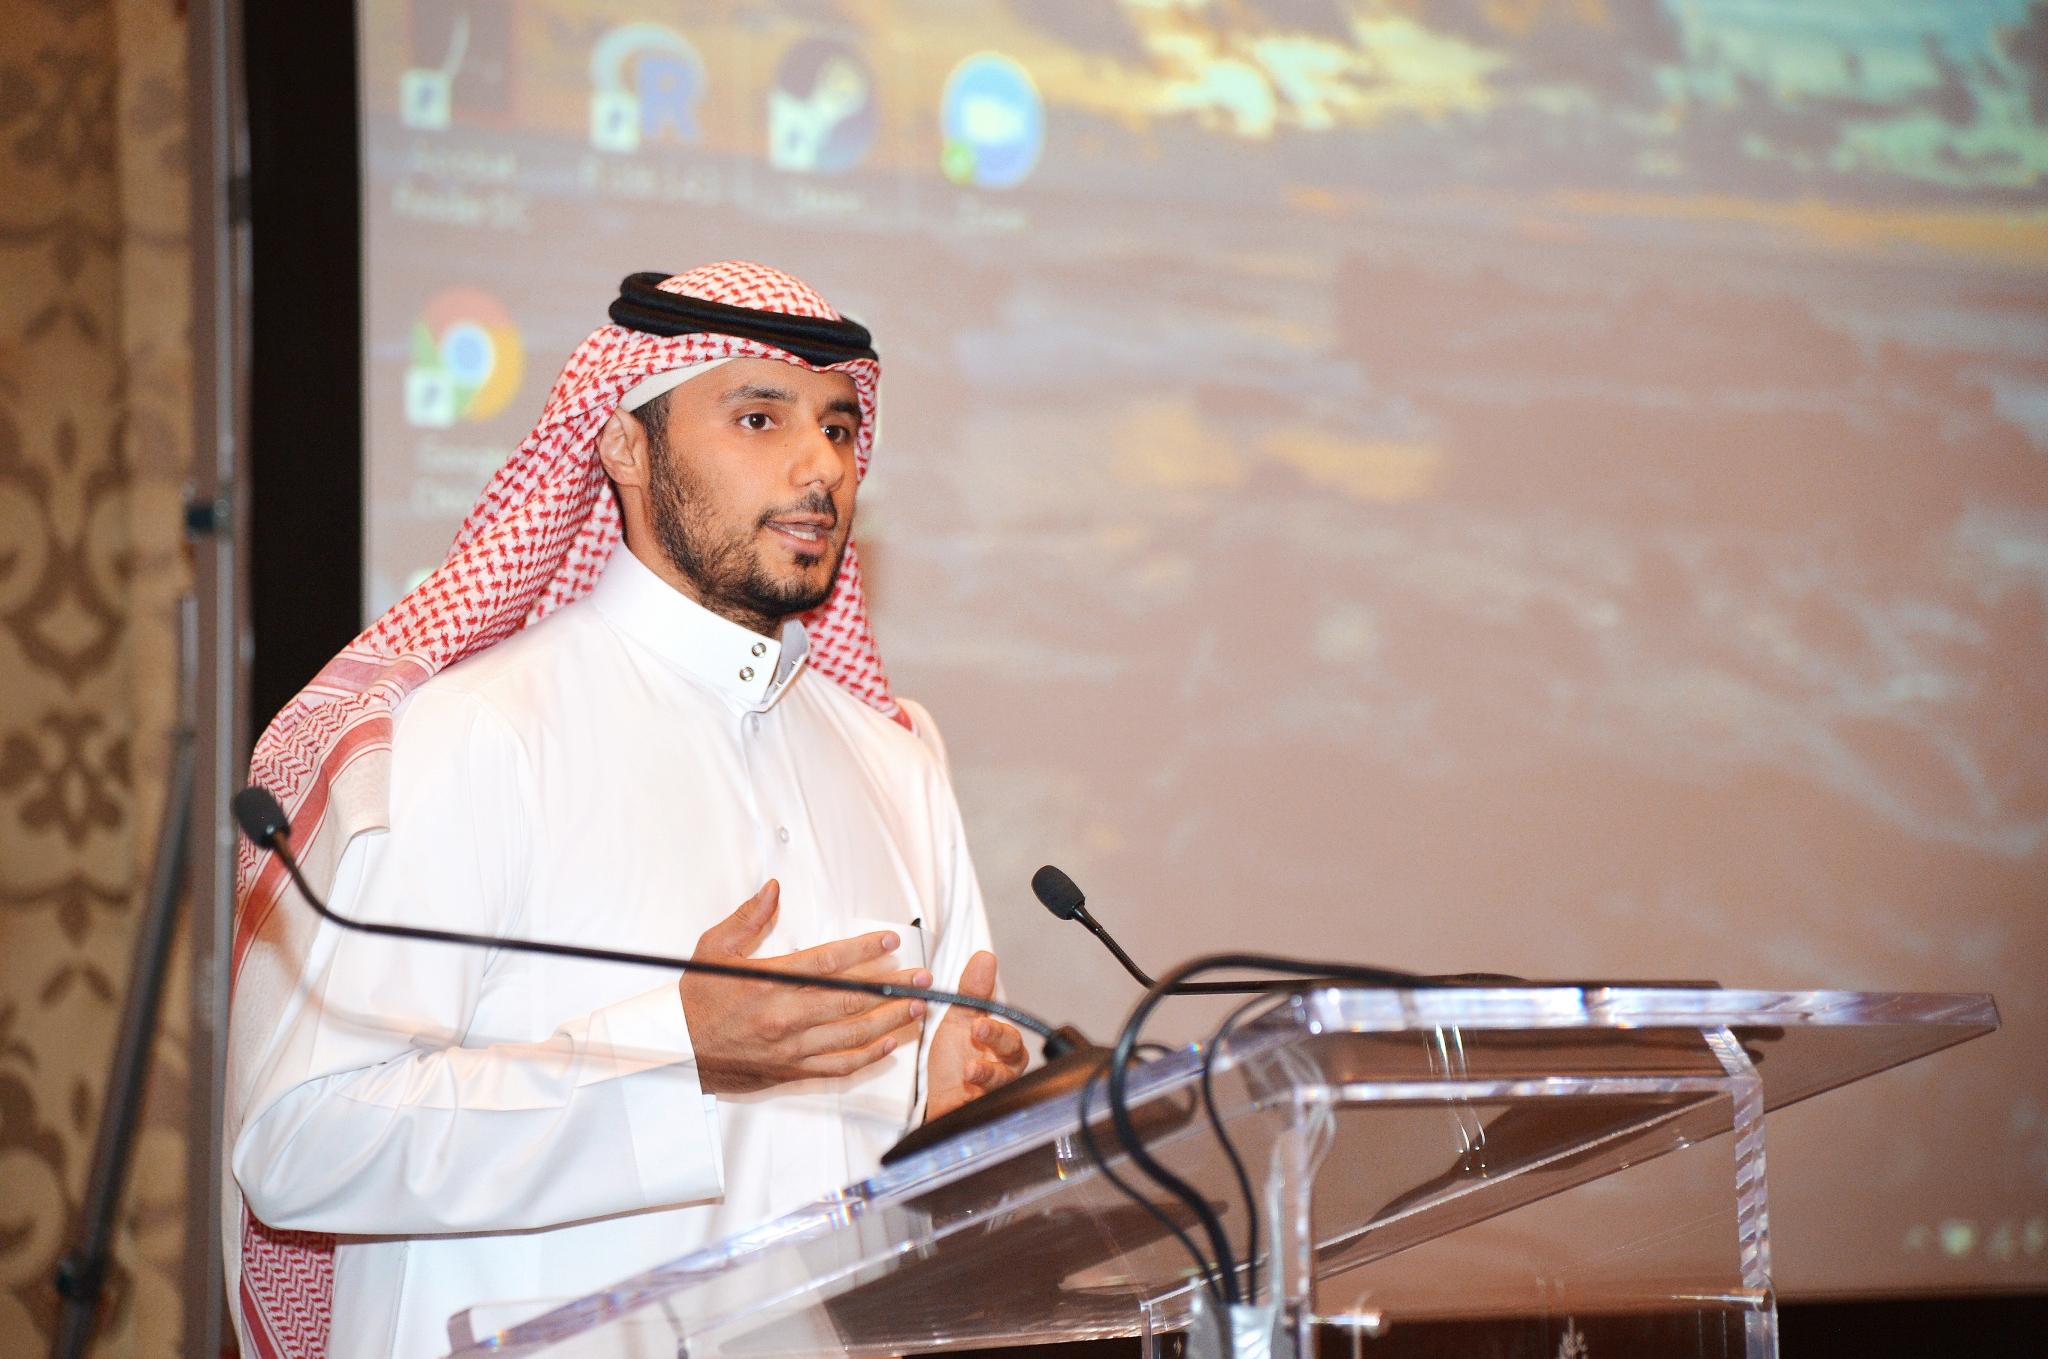 #24: HRH Prince Khaled bin Alwaleed bin Talal, KBW Investments